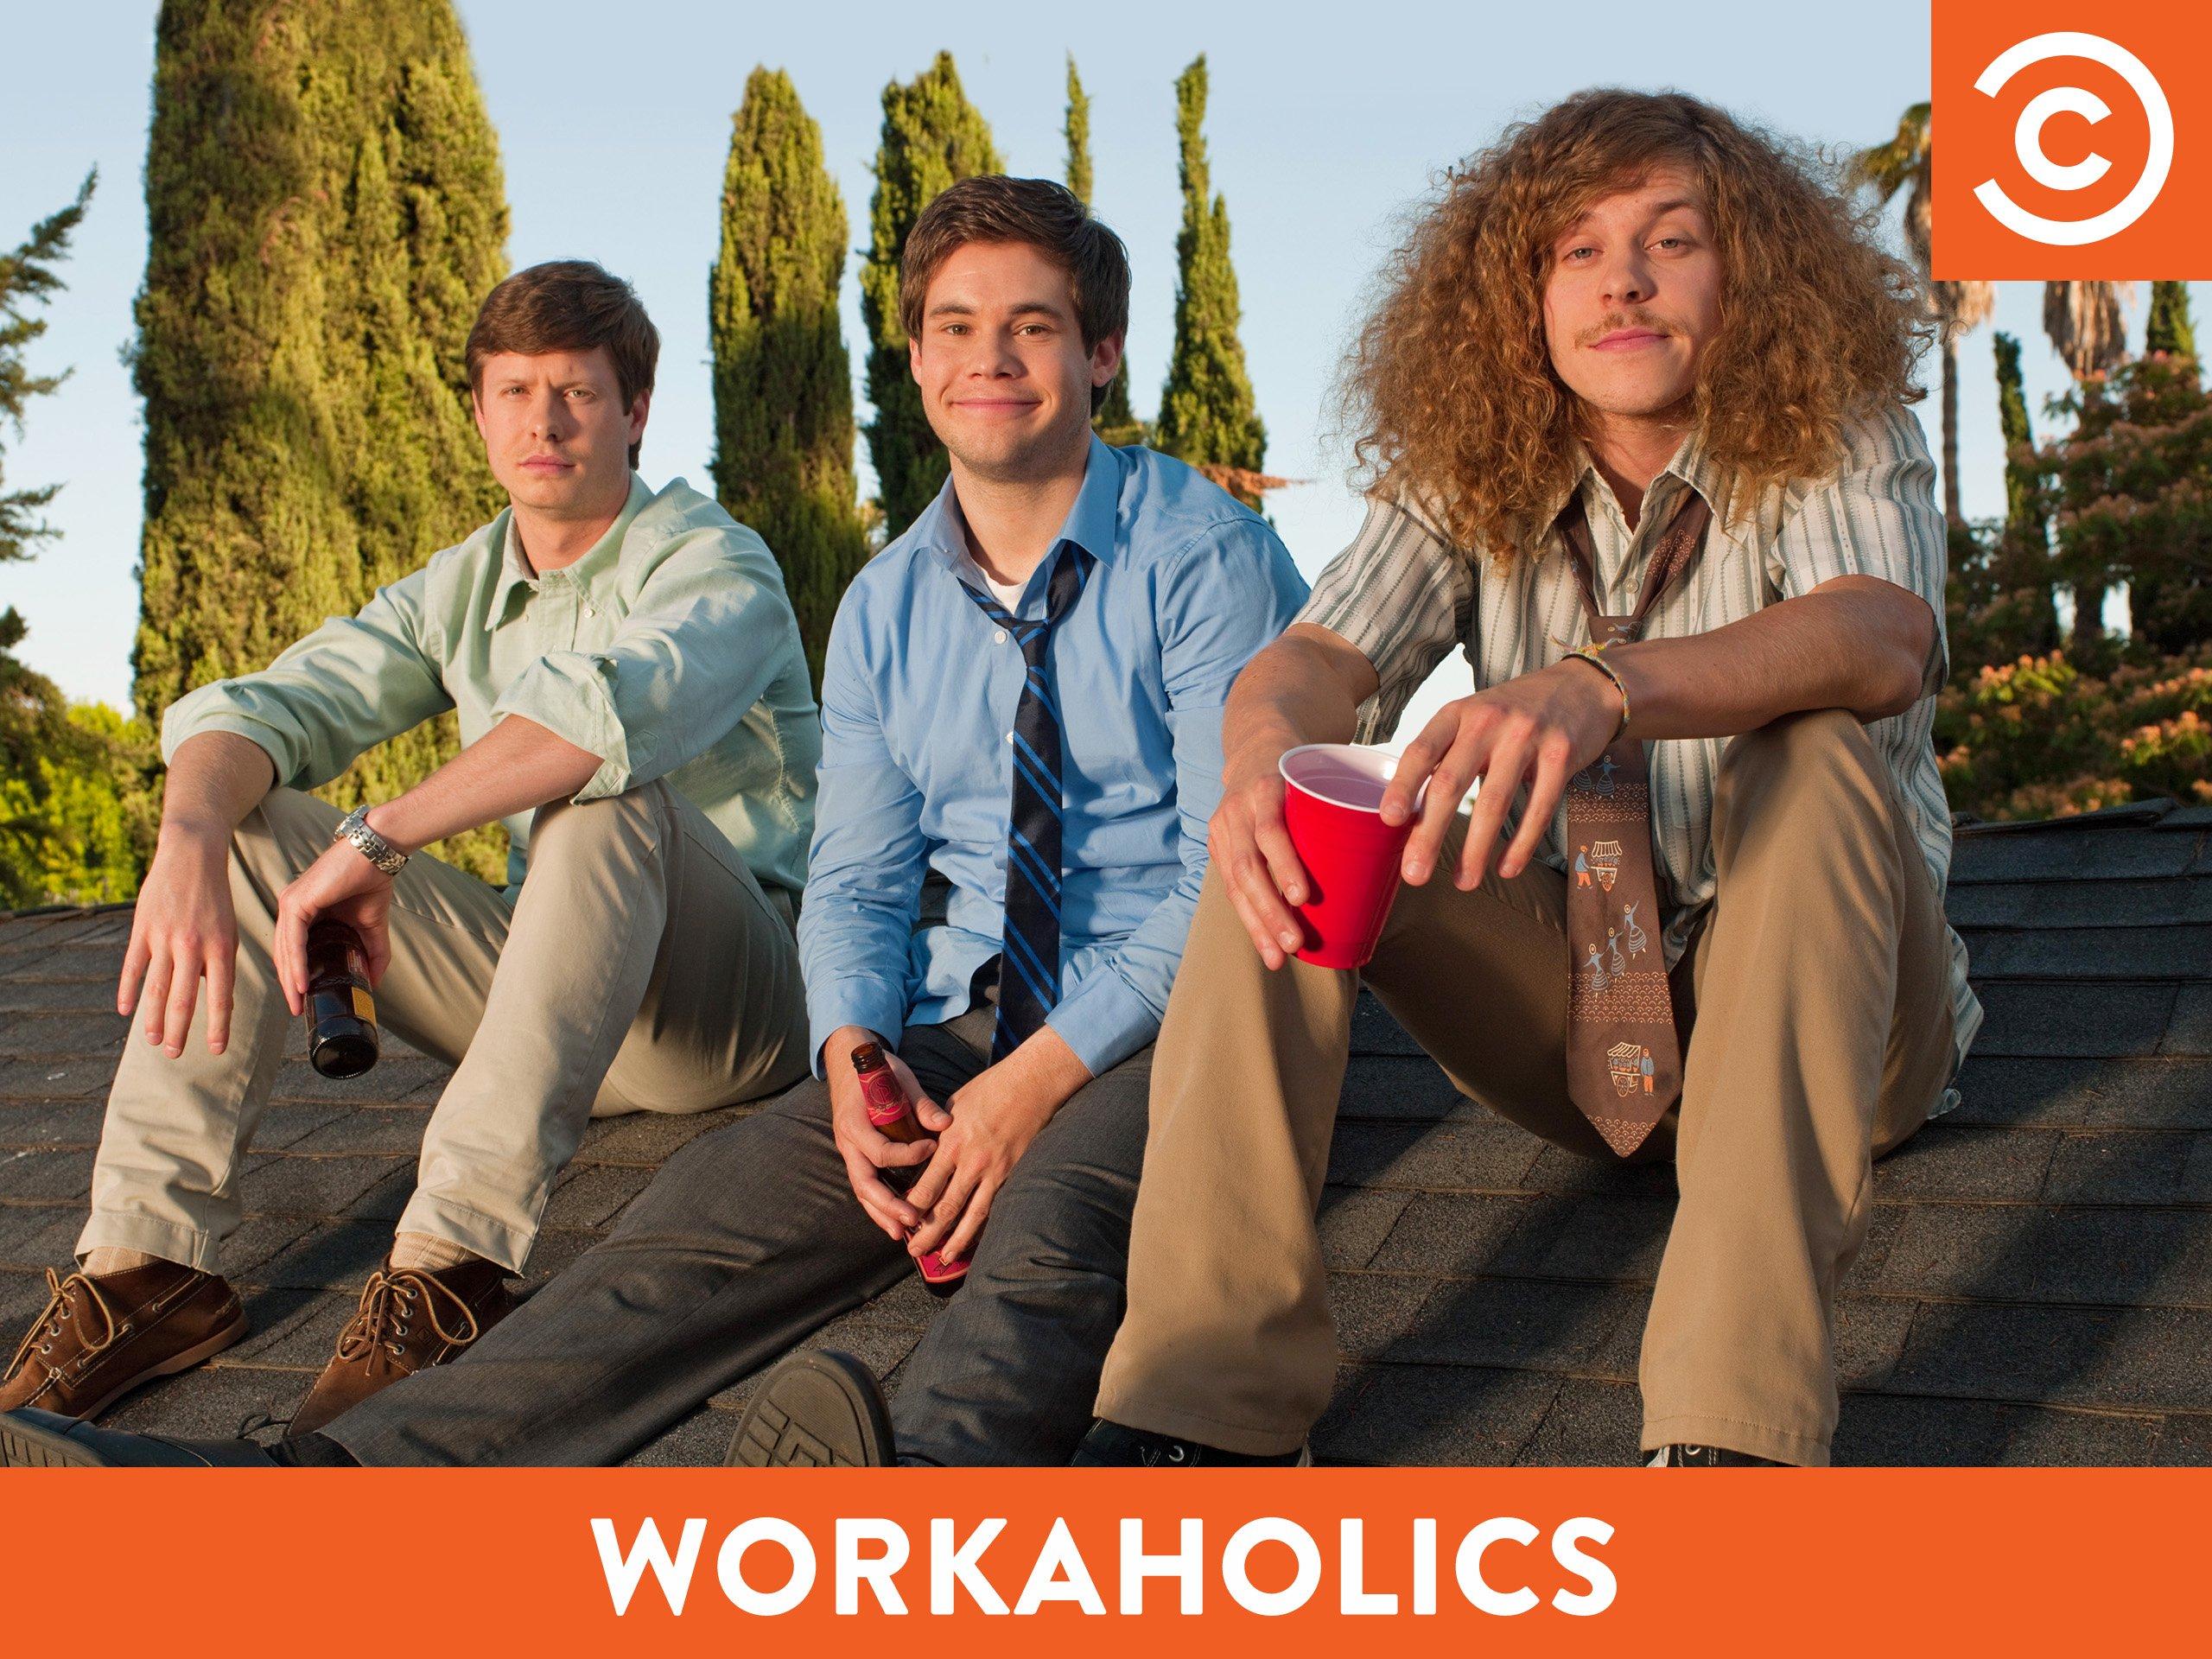 workaholics season 1 episode 4 watch online